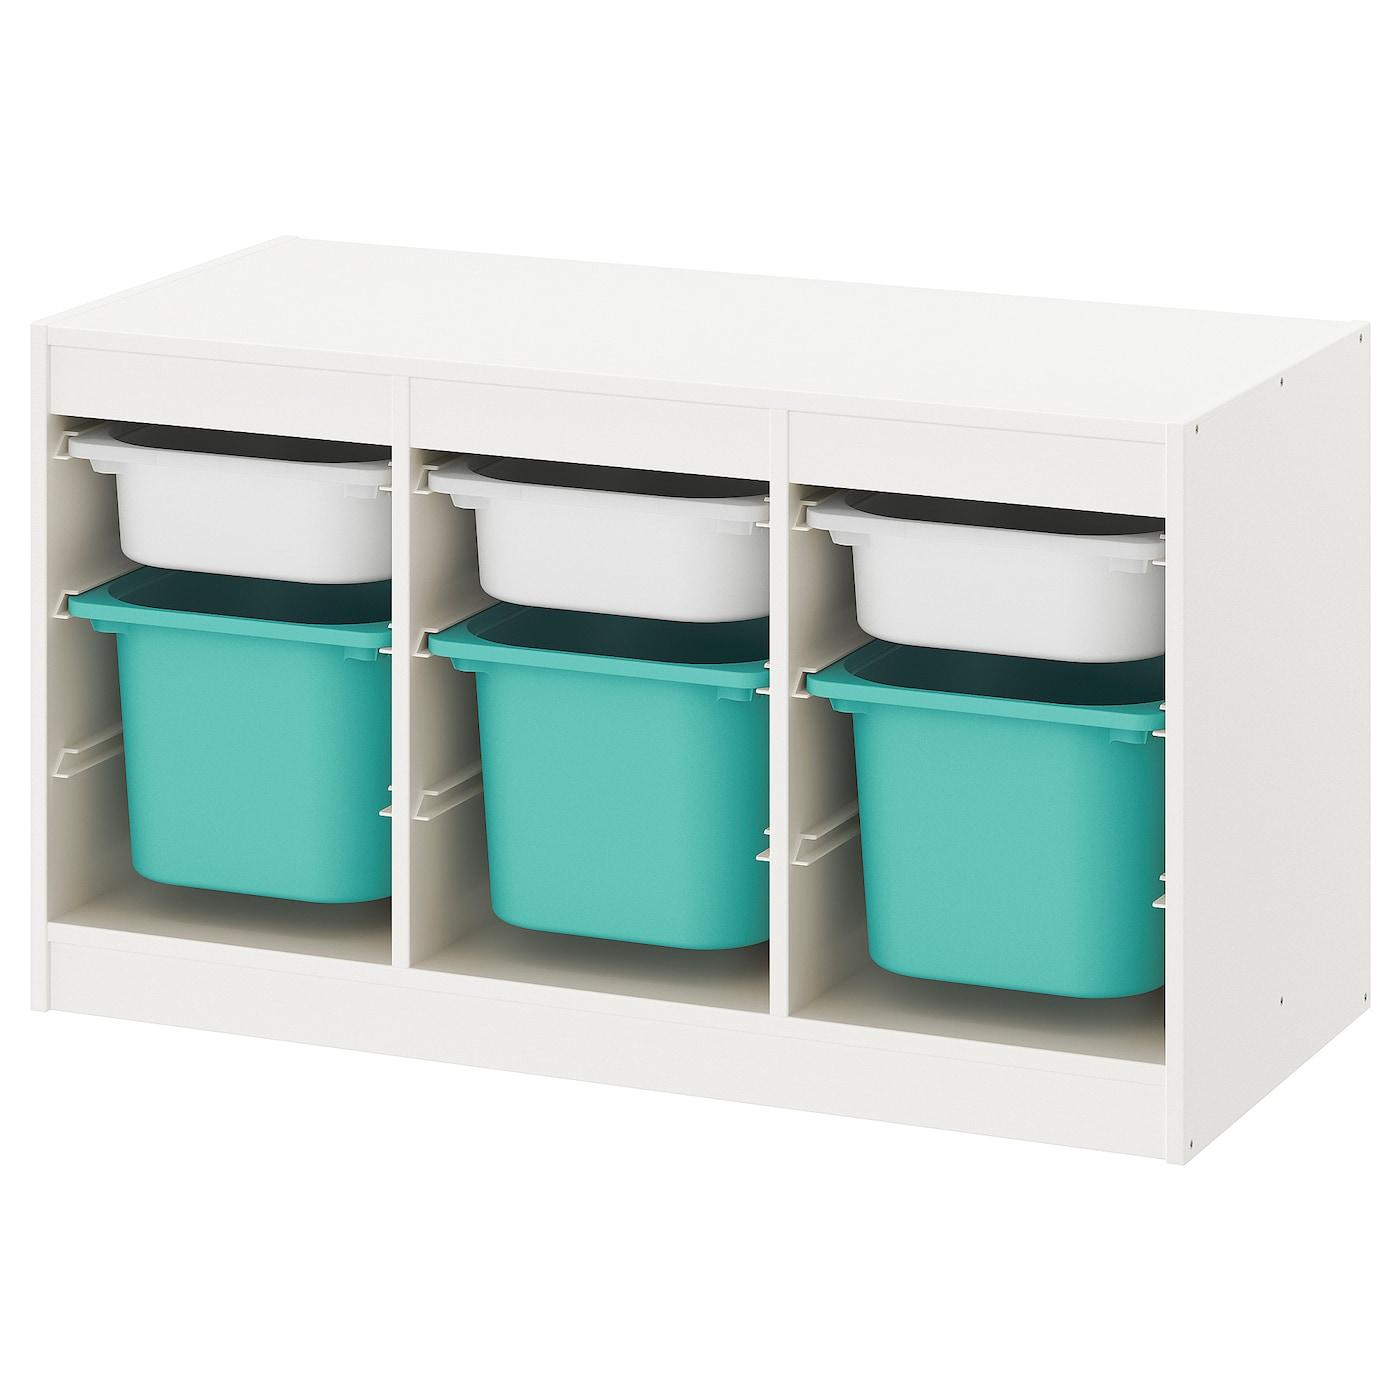 TROFAST Combi rangement+boîtes - blanc, turquoise - IKEA